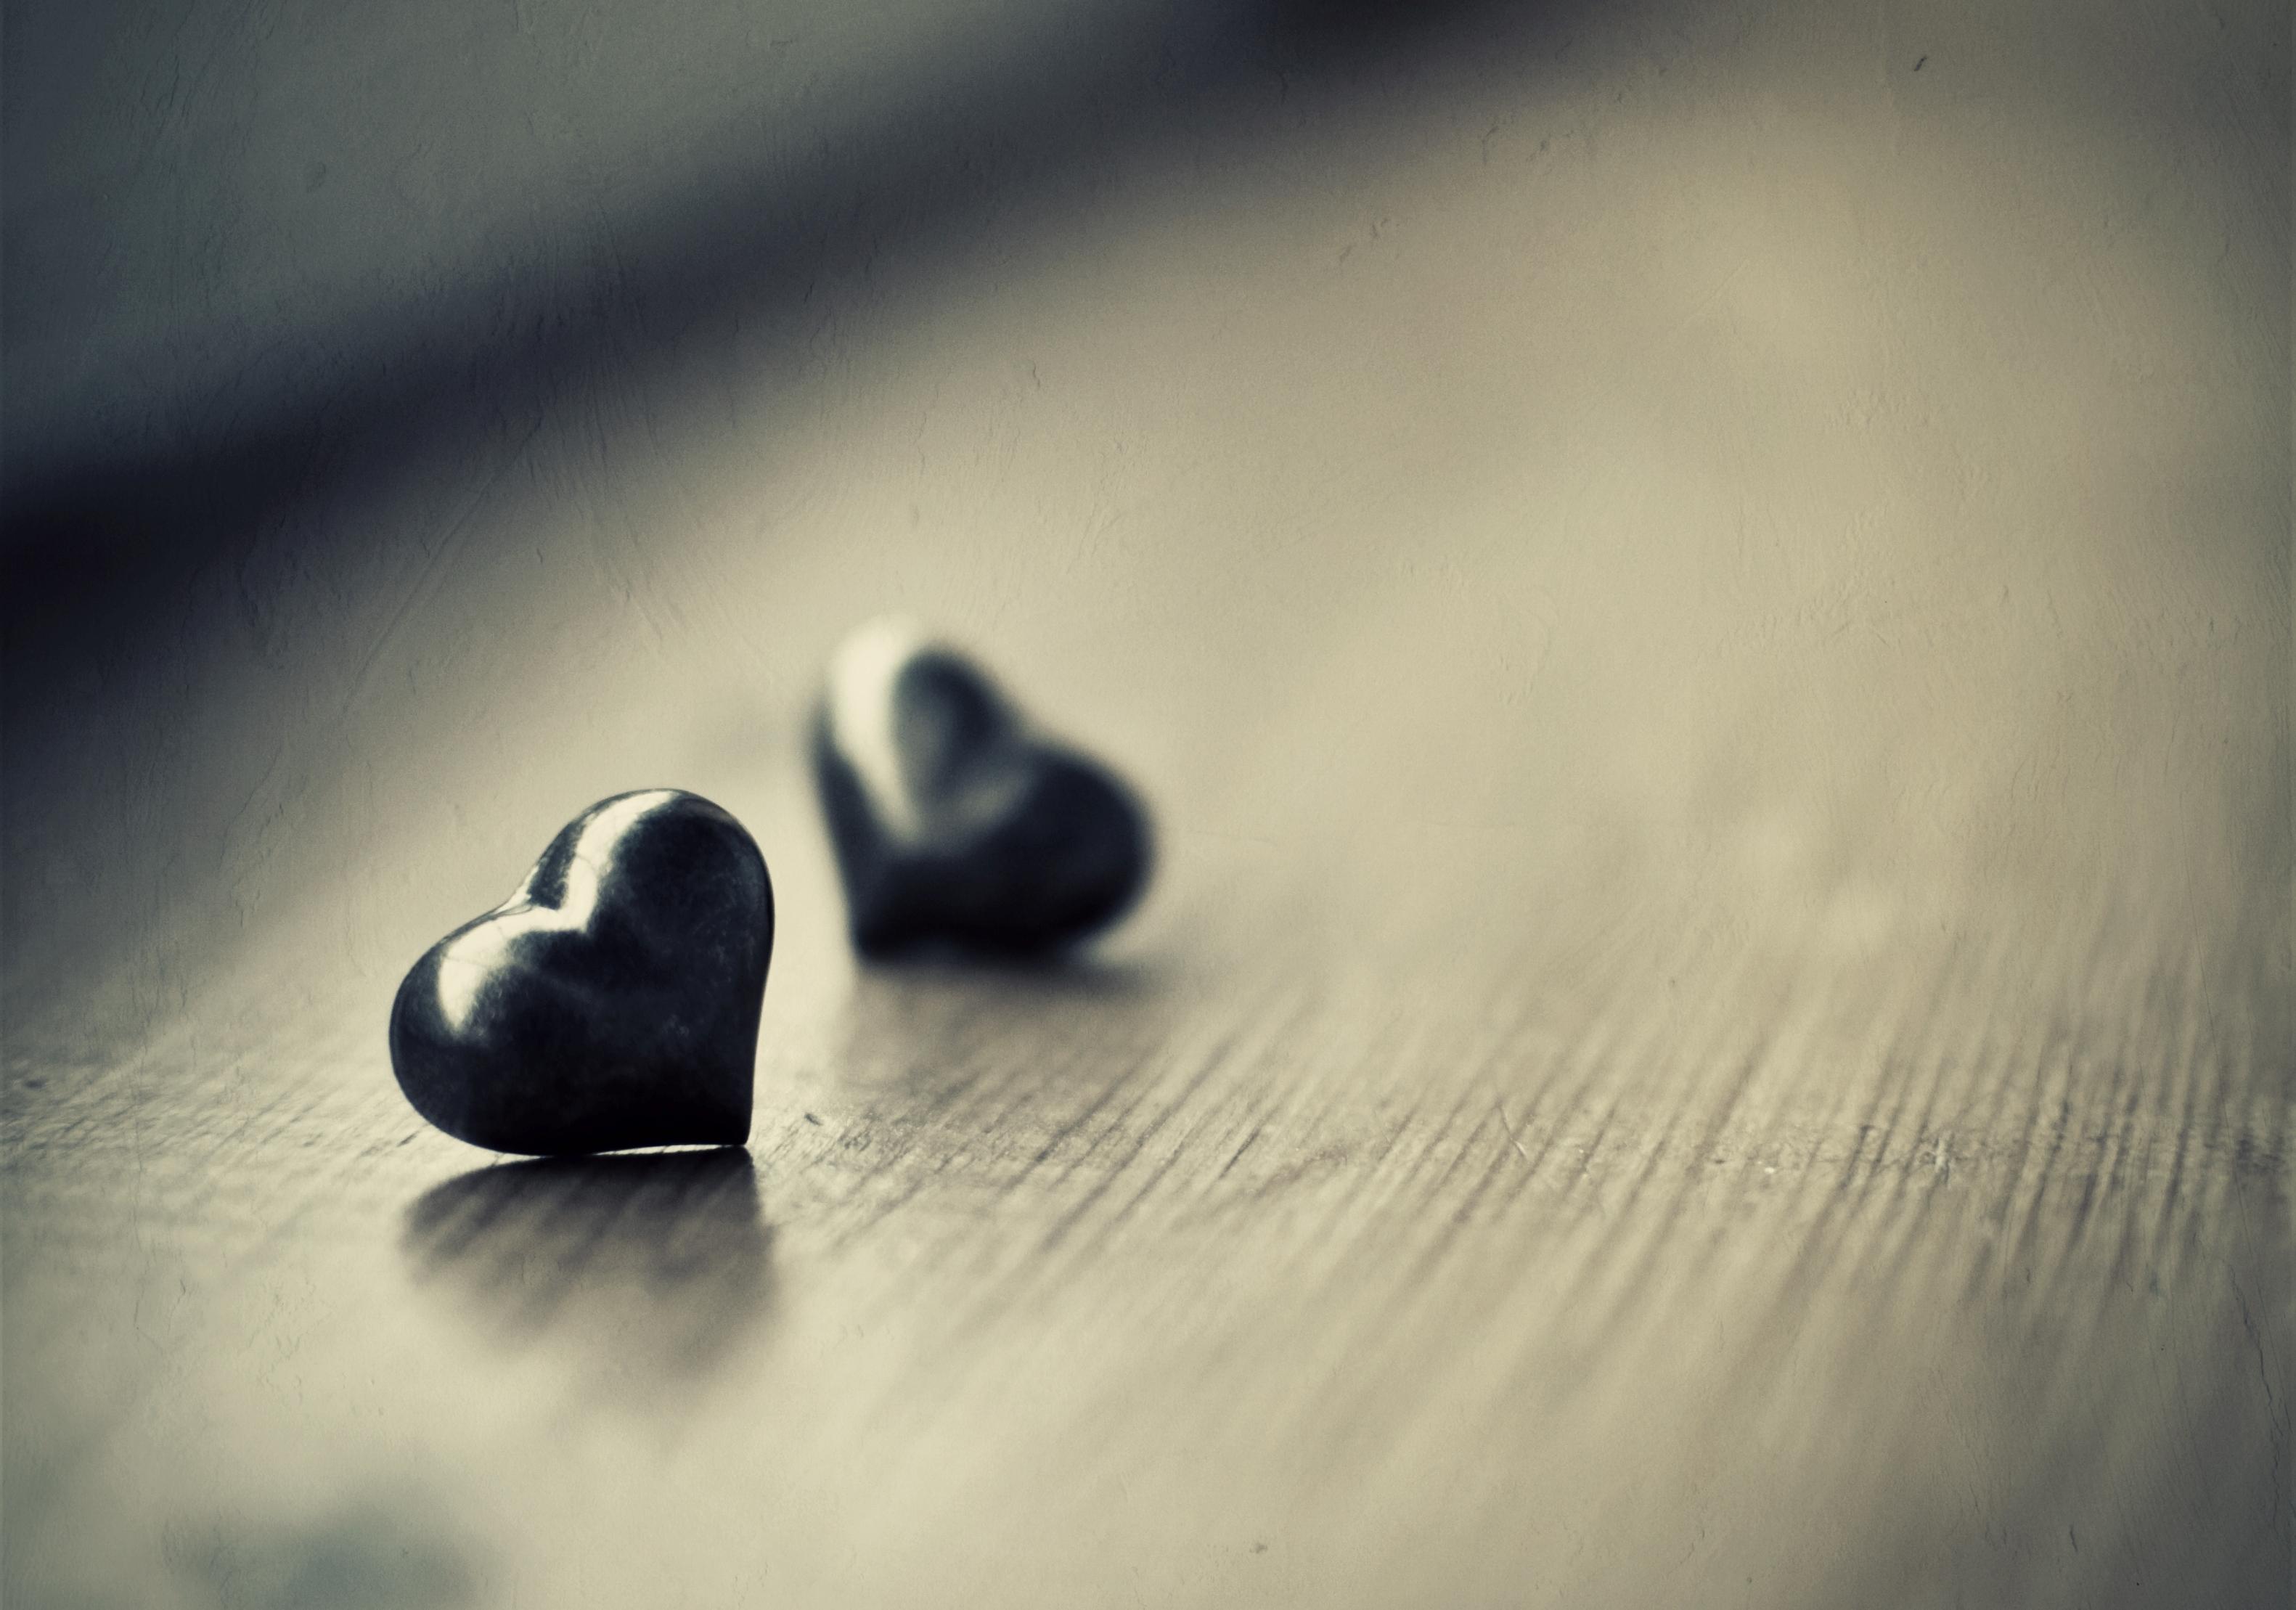 Картинки грустного стиха с сердечками